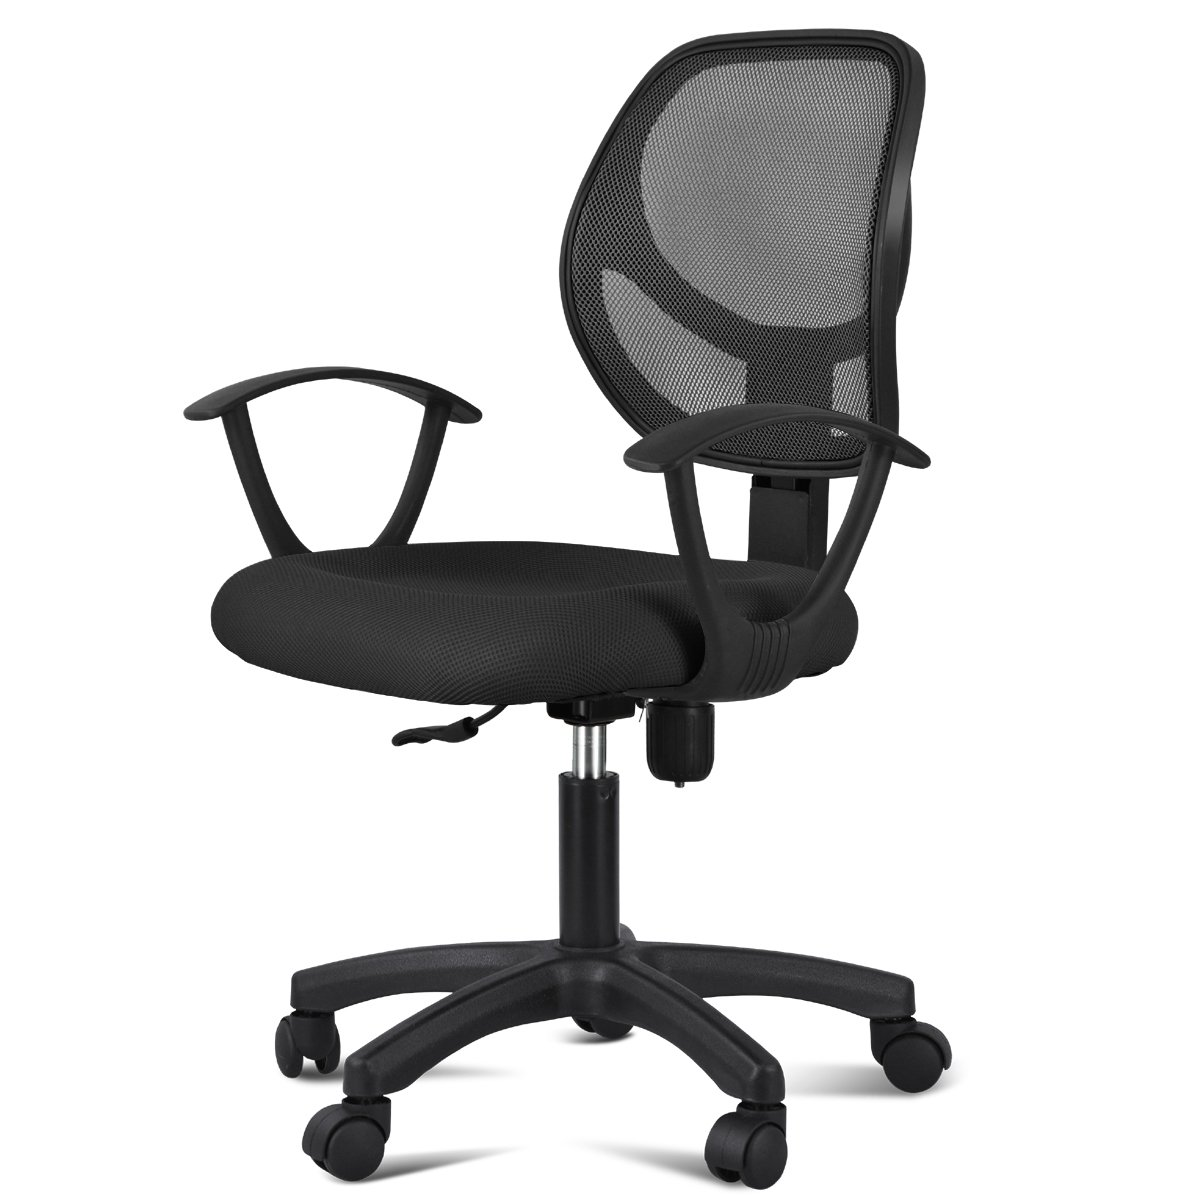 Yaheetech Mesh Chrome Adjustable Office Computer Desk Chair (Style1+Black)